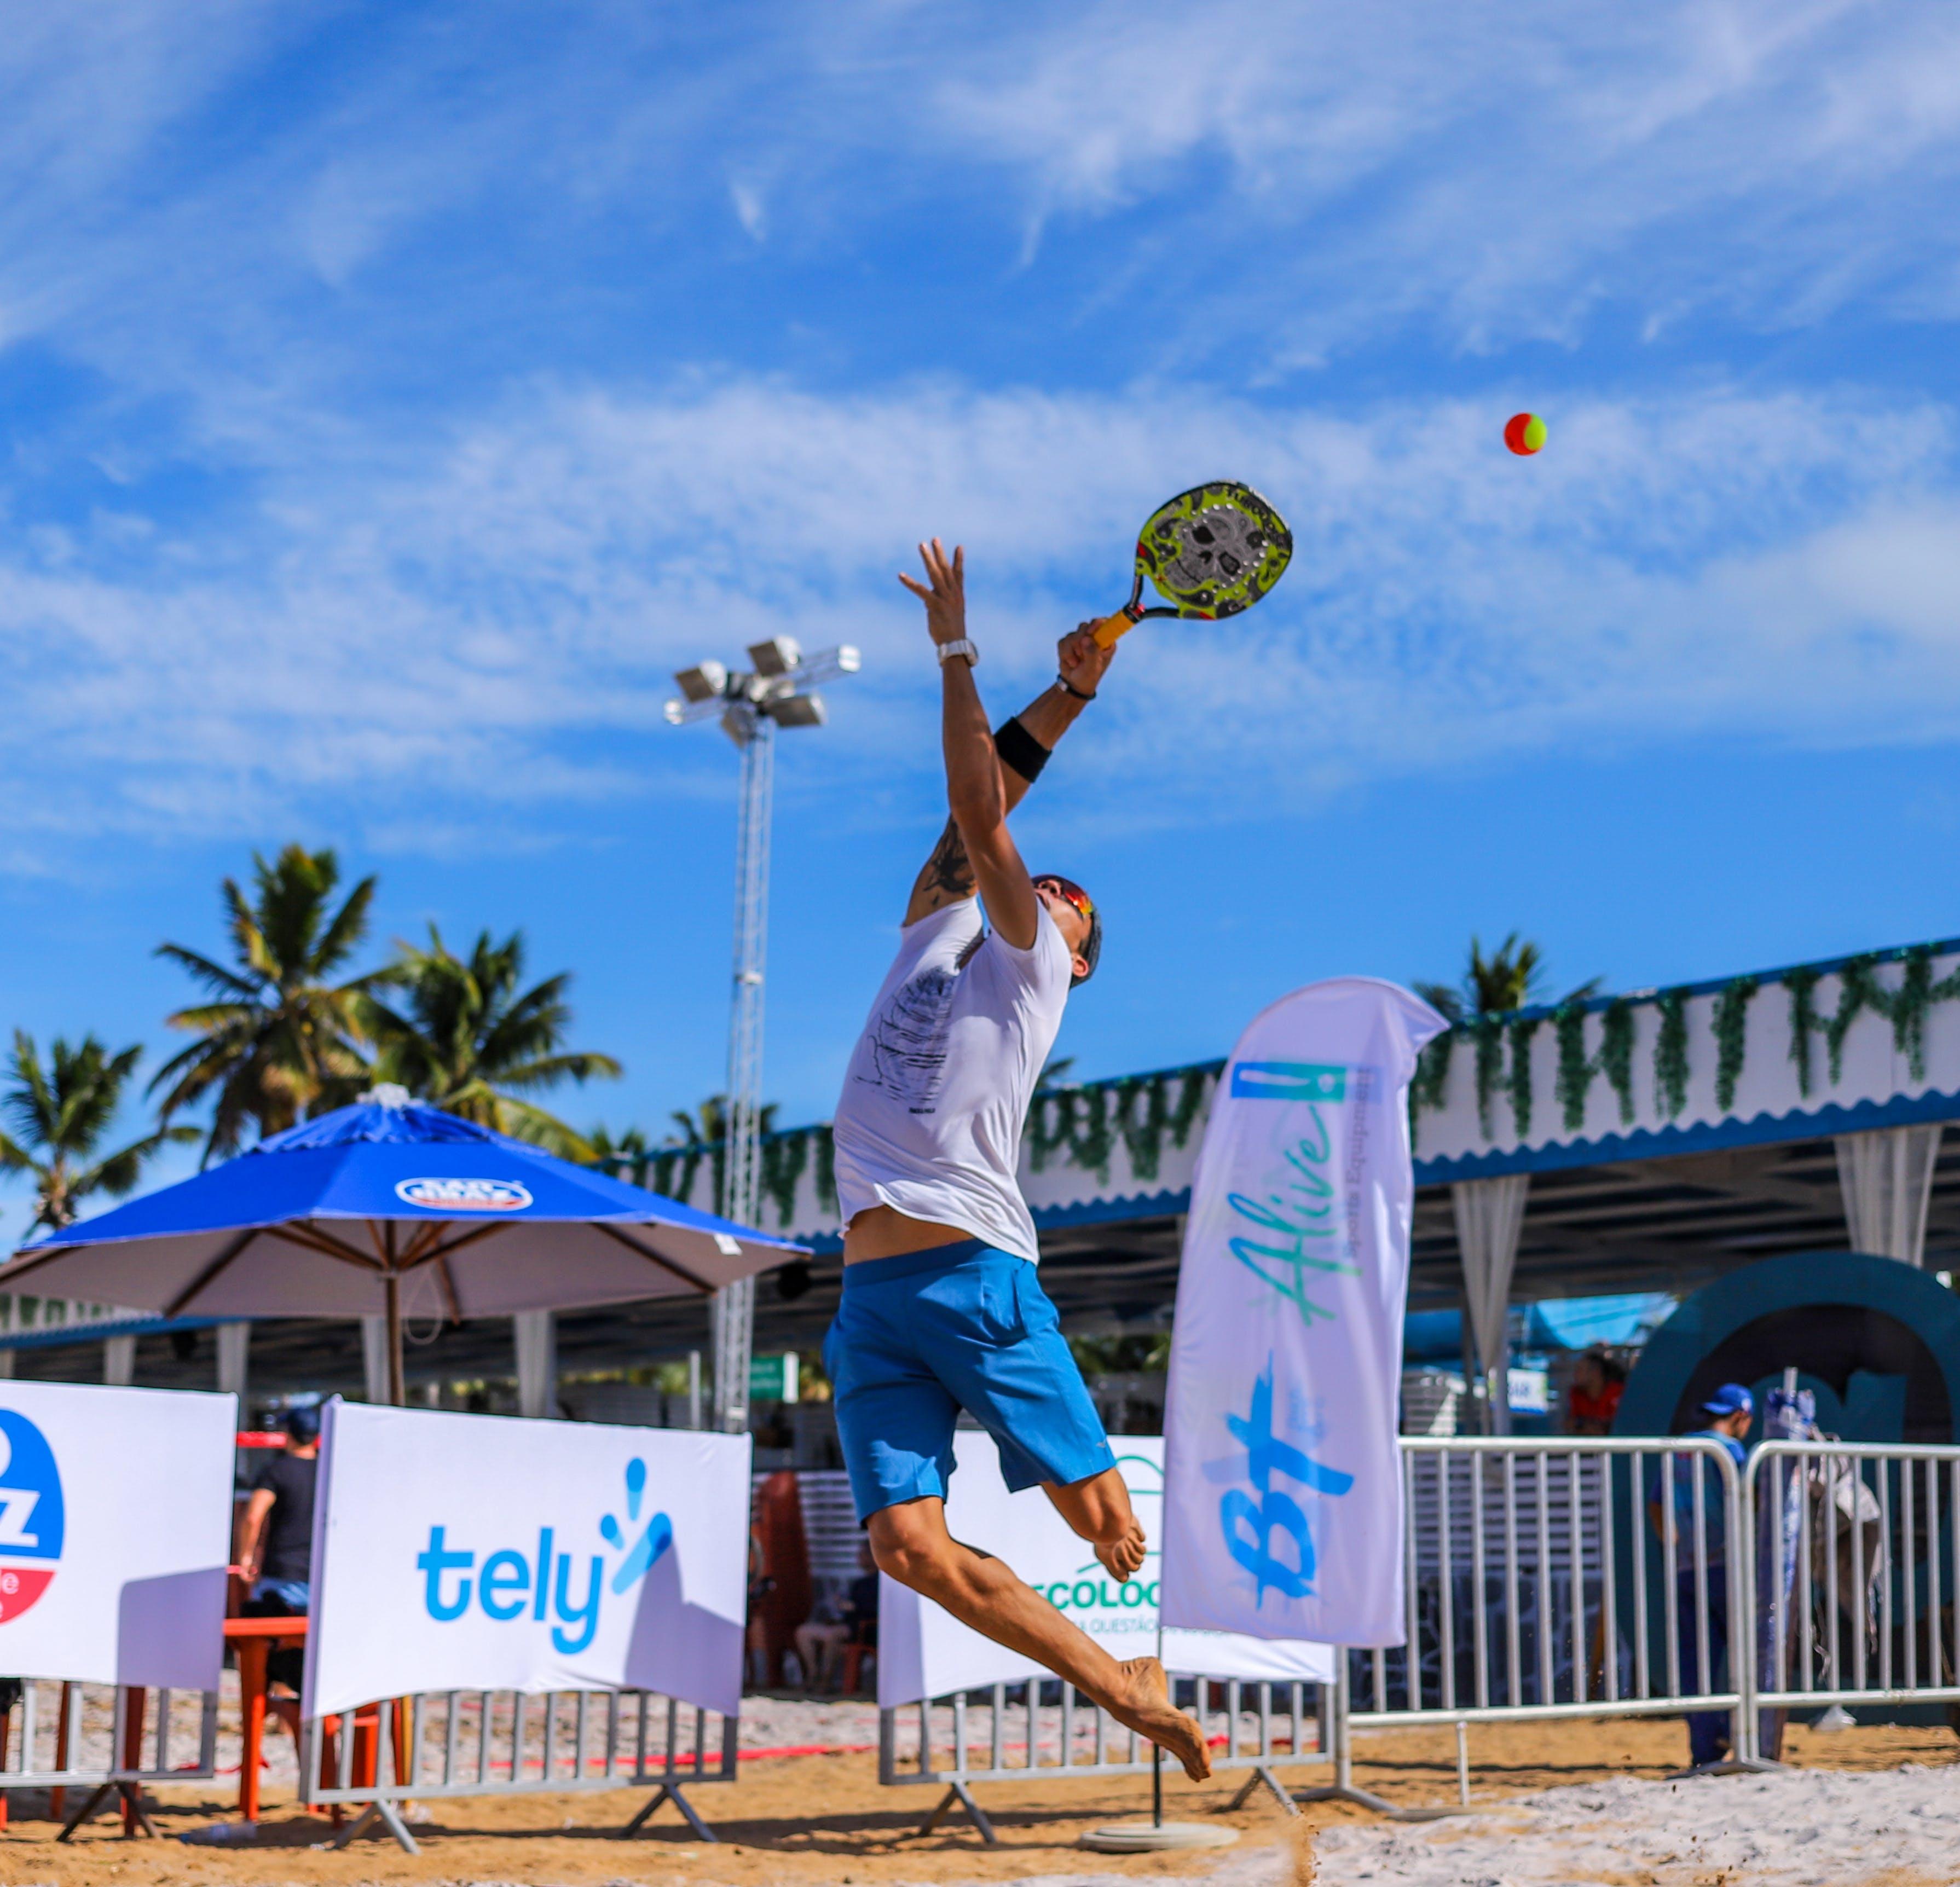 Free stock photo of paddle tennis, table tennis, tennis, tennis ball